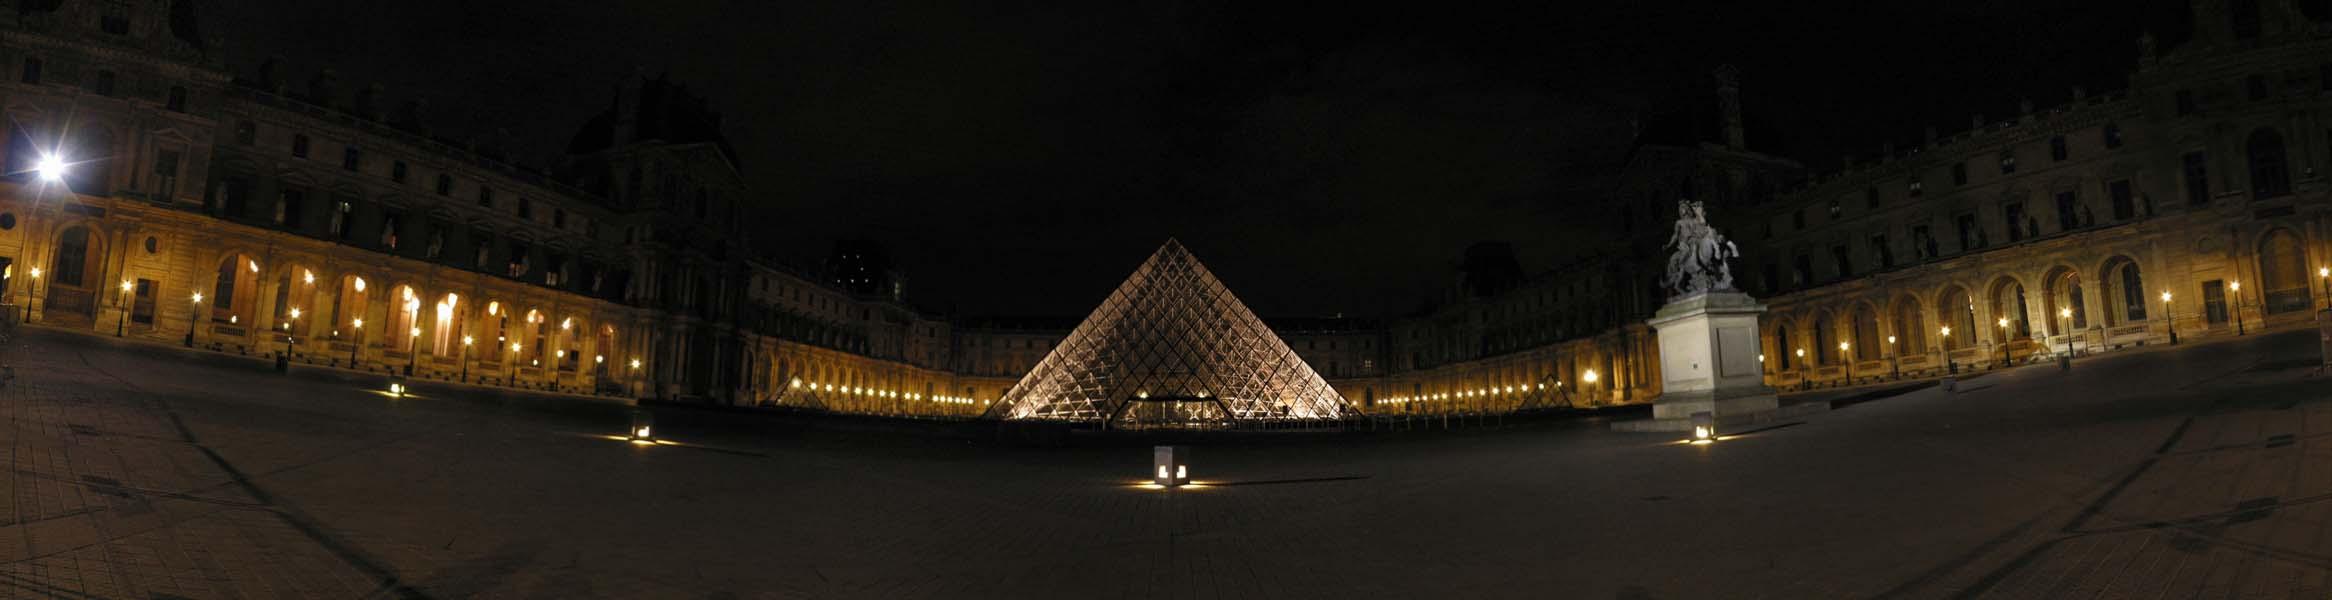 Paris May 2002 / night_court Night